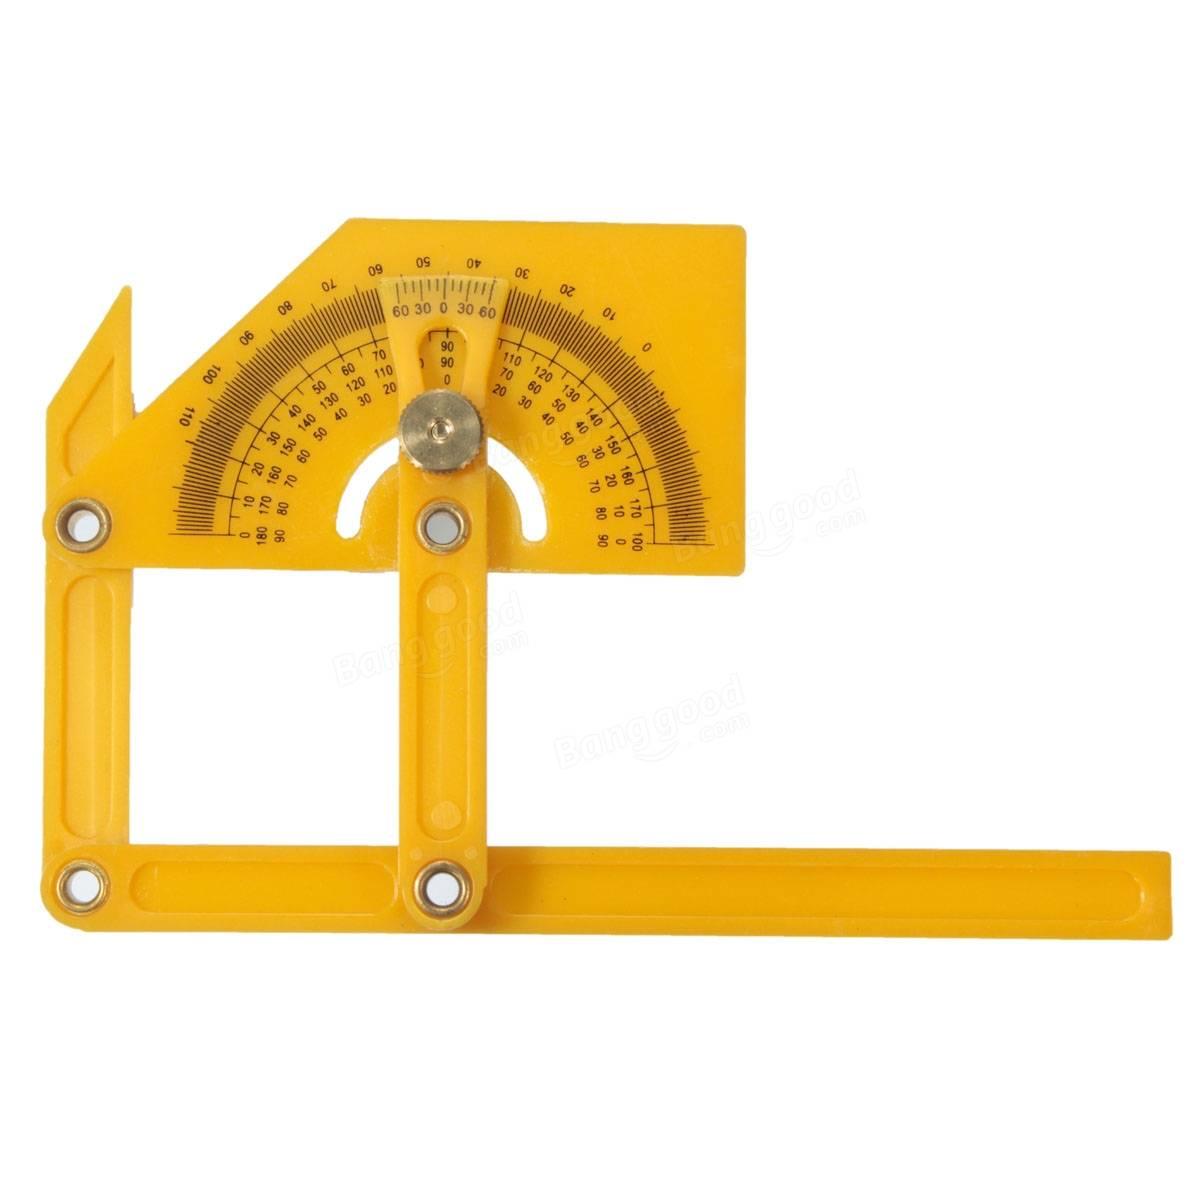 8195 template - Plastic Adjustable Bevel Angle Gauge Level Indicator Angle Finder Protractor Measurement Tool